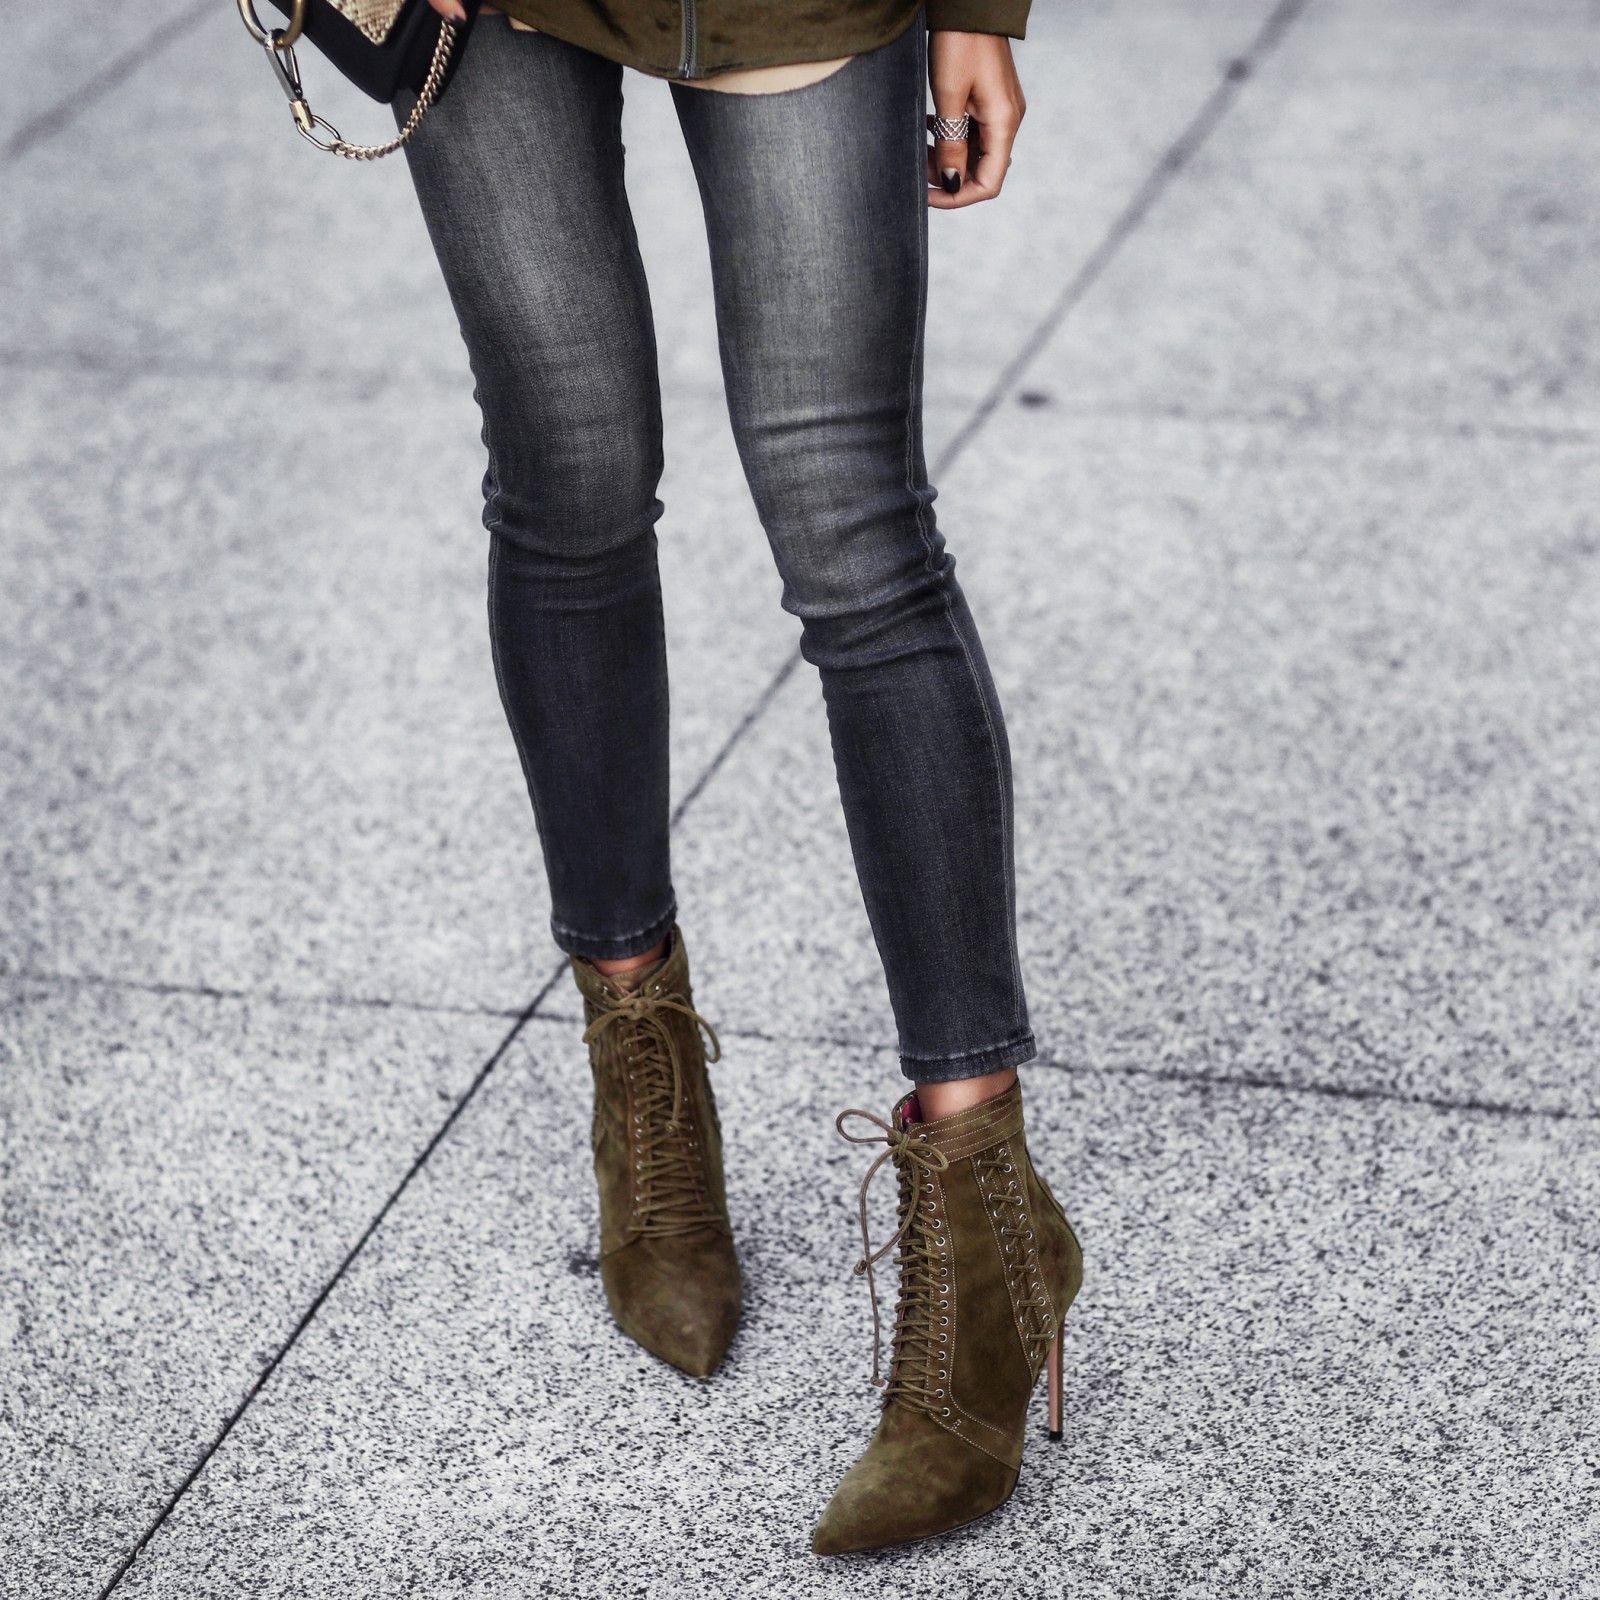 575e9efeaa6 Women's Steve Madden Satisfied Corset-Lace Bootie | Closet | Fashion ...